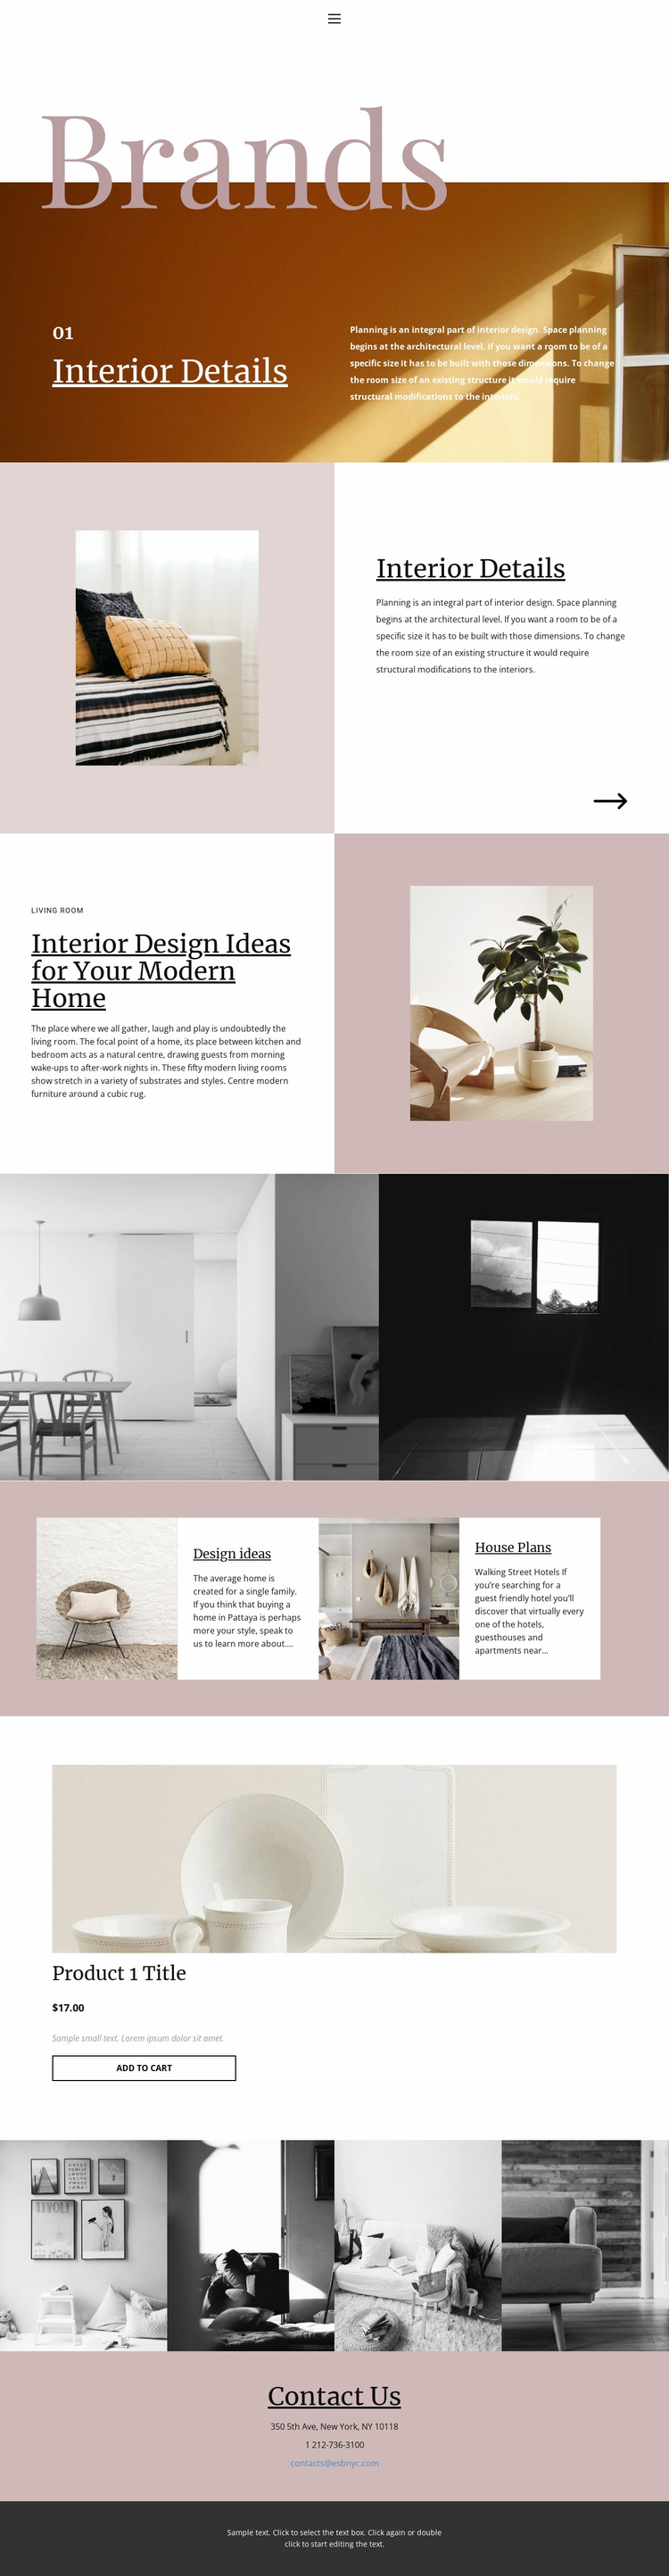 I am an interior designer Website Template